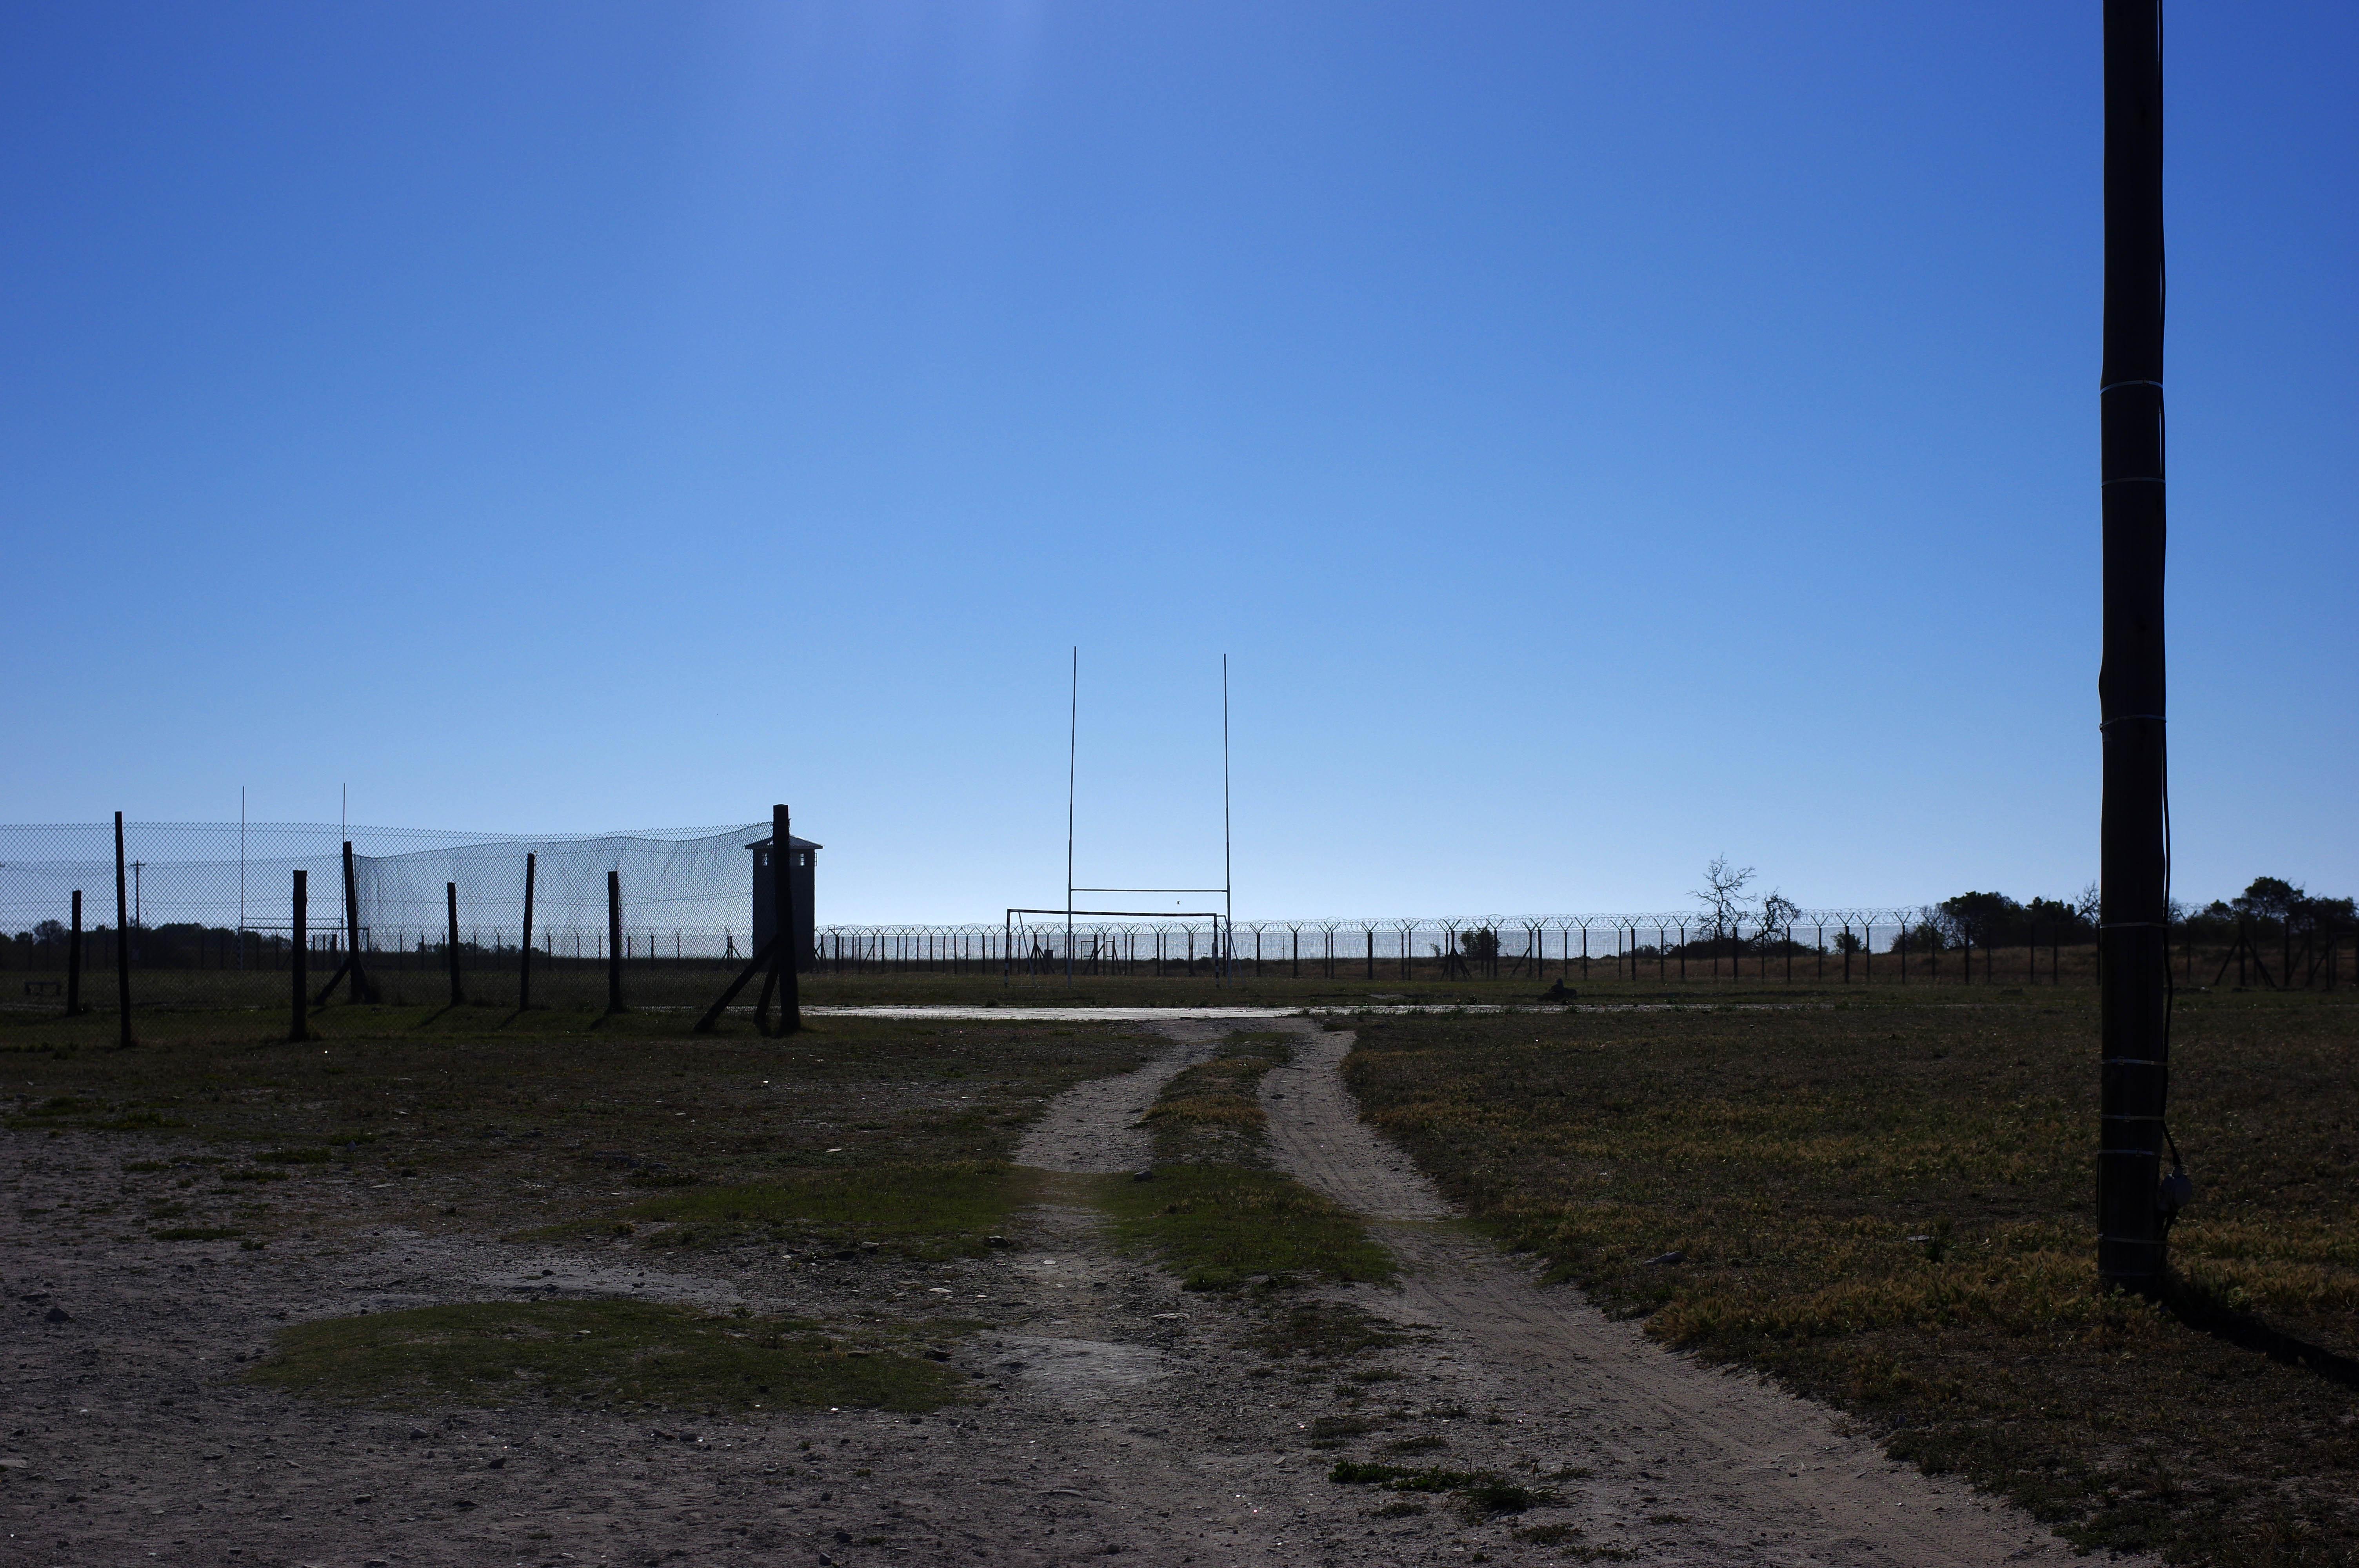 171122_CT_Robben island10